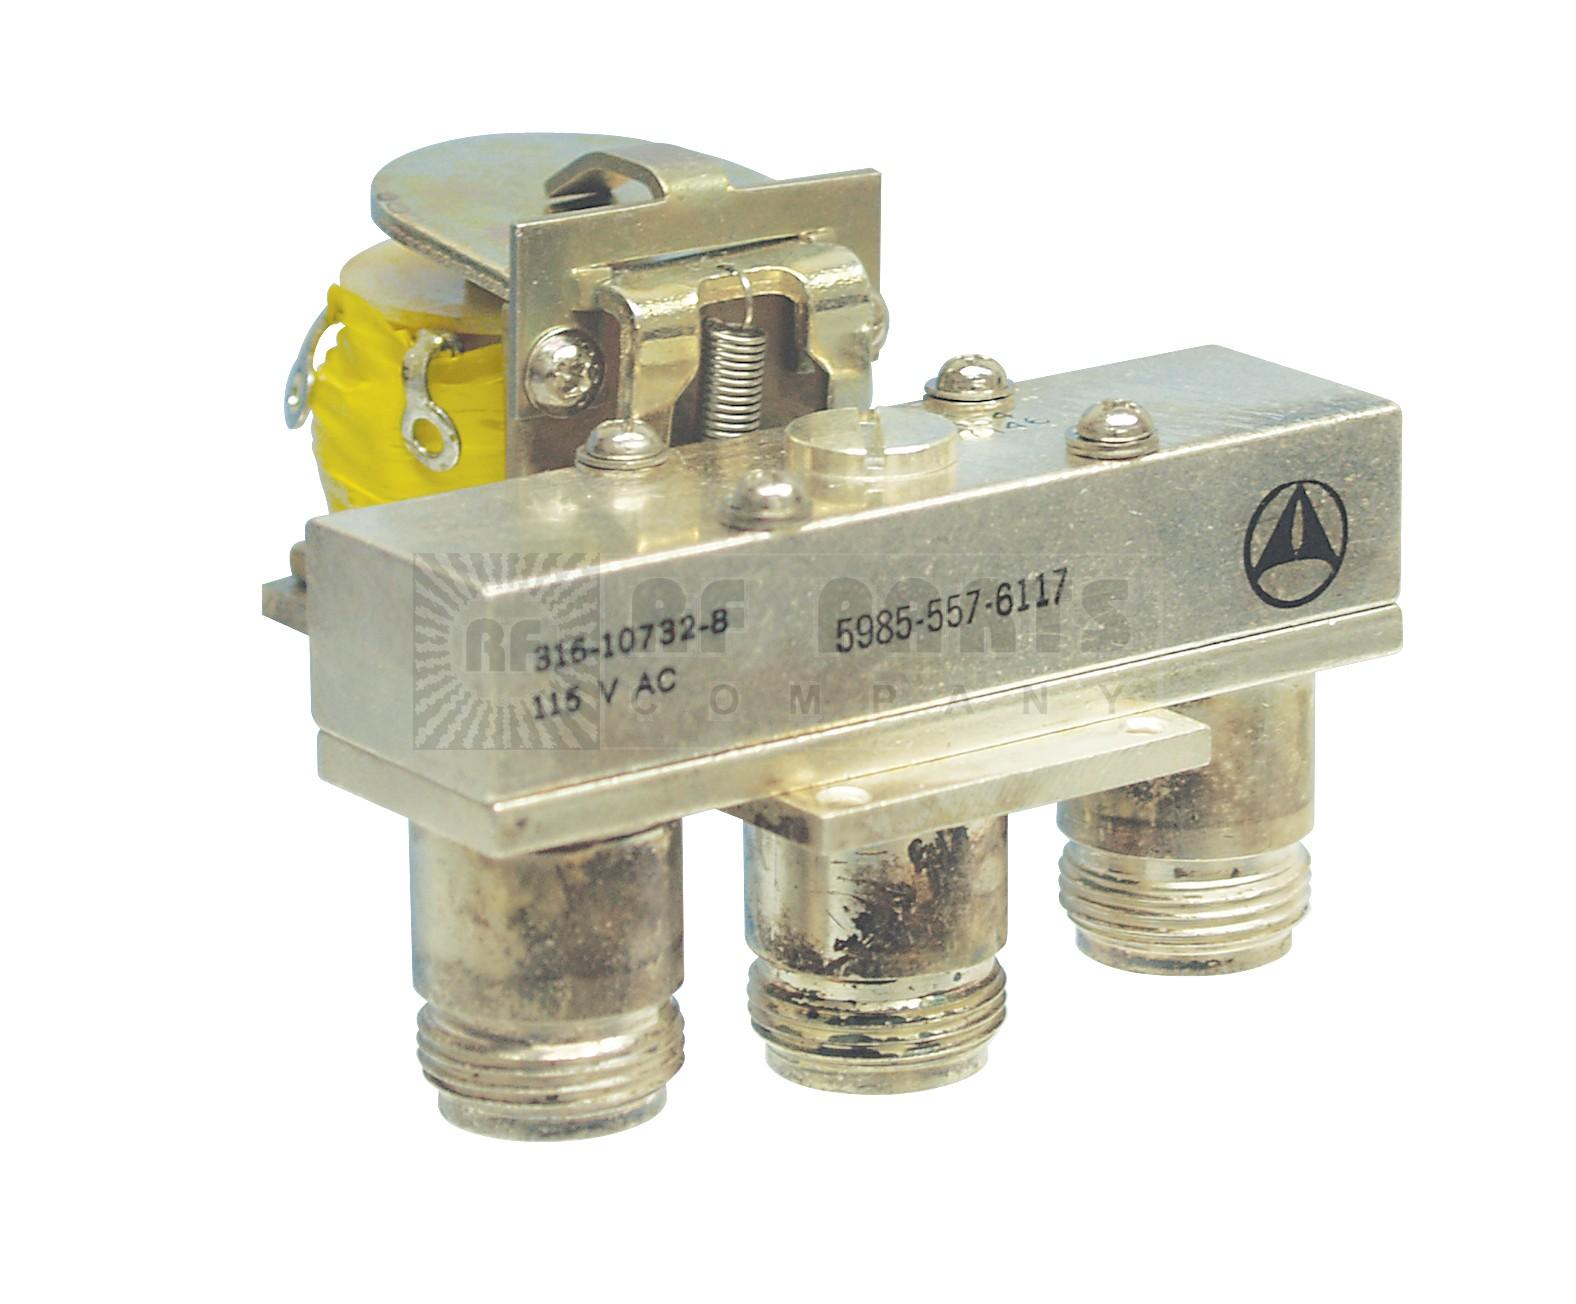 316-10732-8 Coaxial relay, spdt 3 type-n(f)